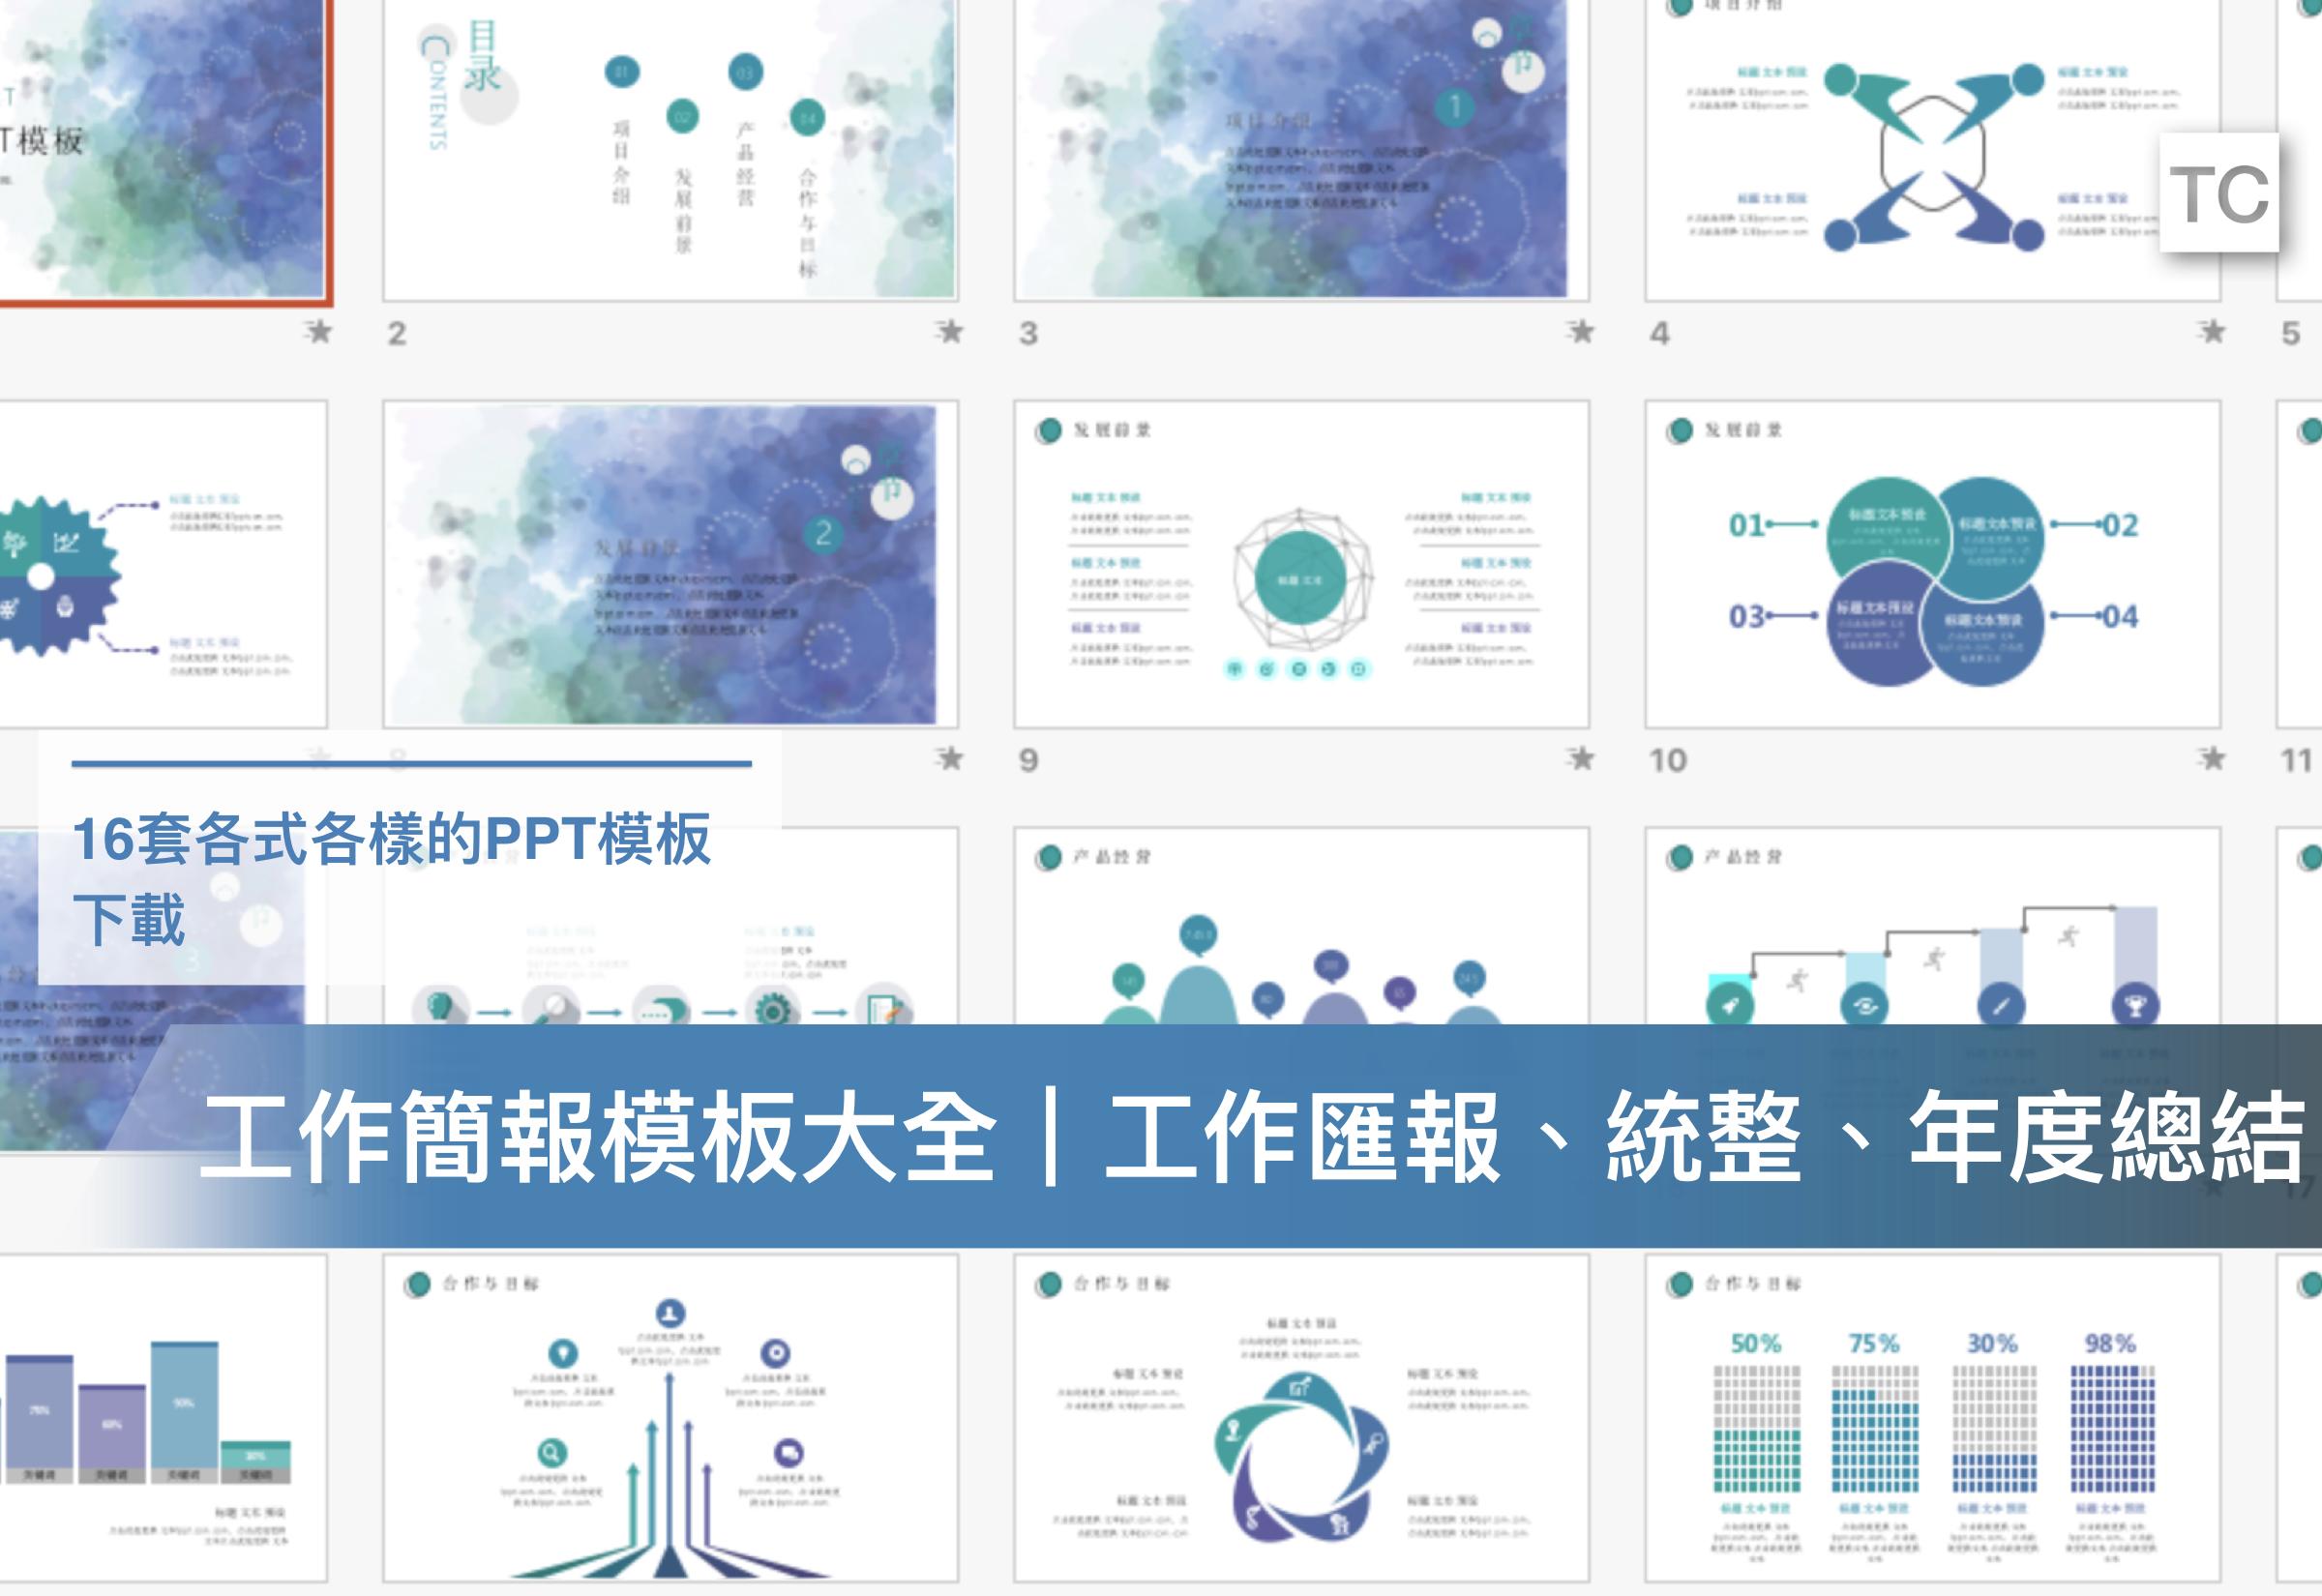 【PPT模板】2020工作簡報大全,工作匯報、工作統整必備